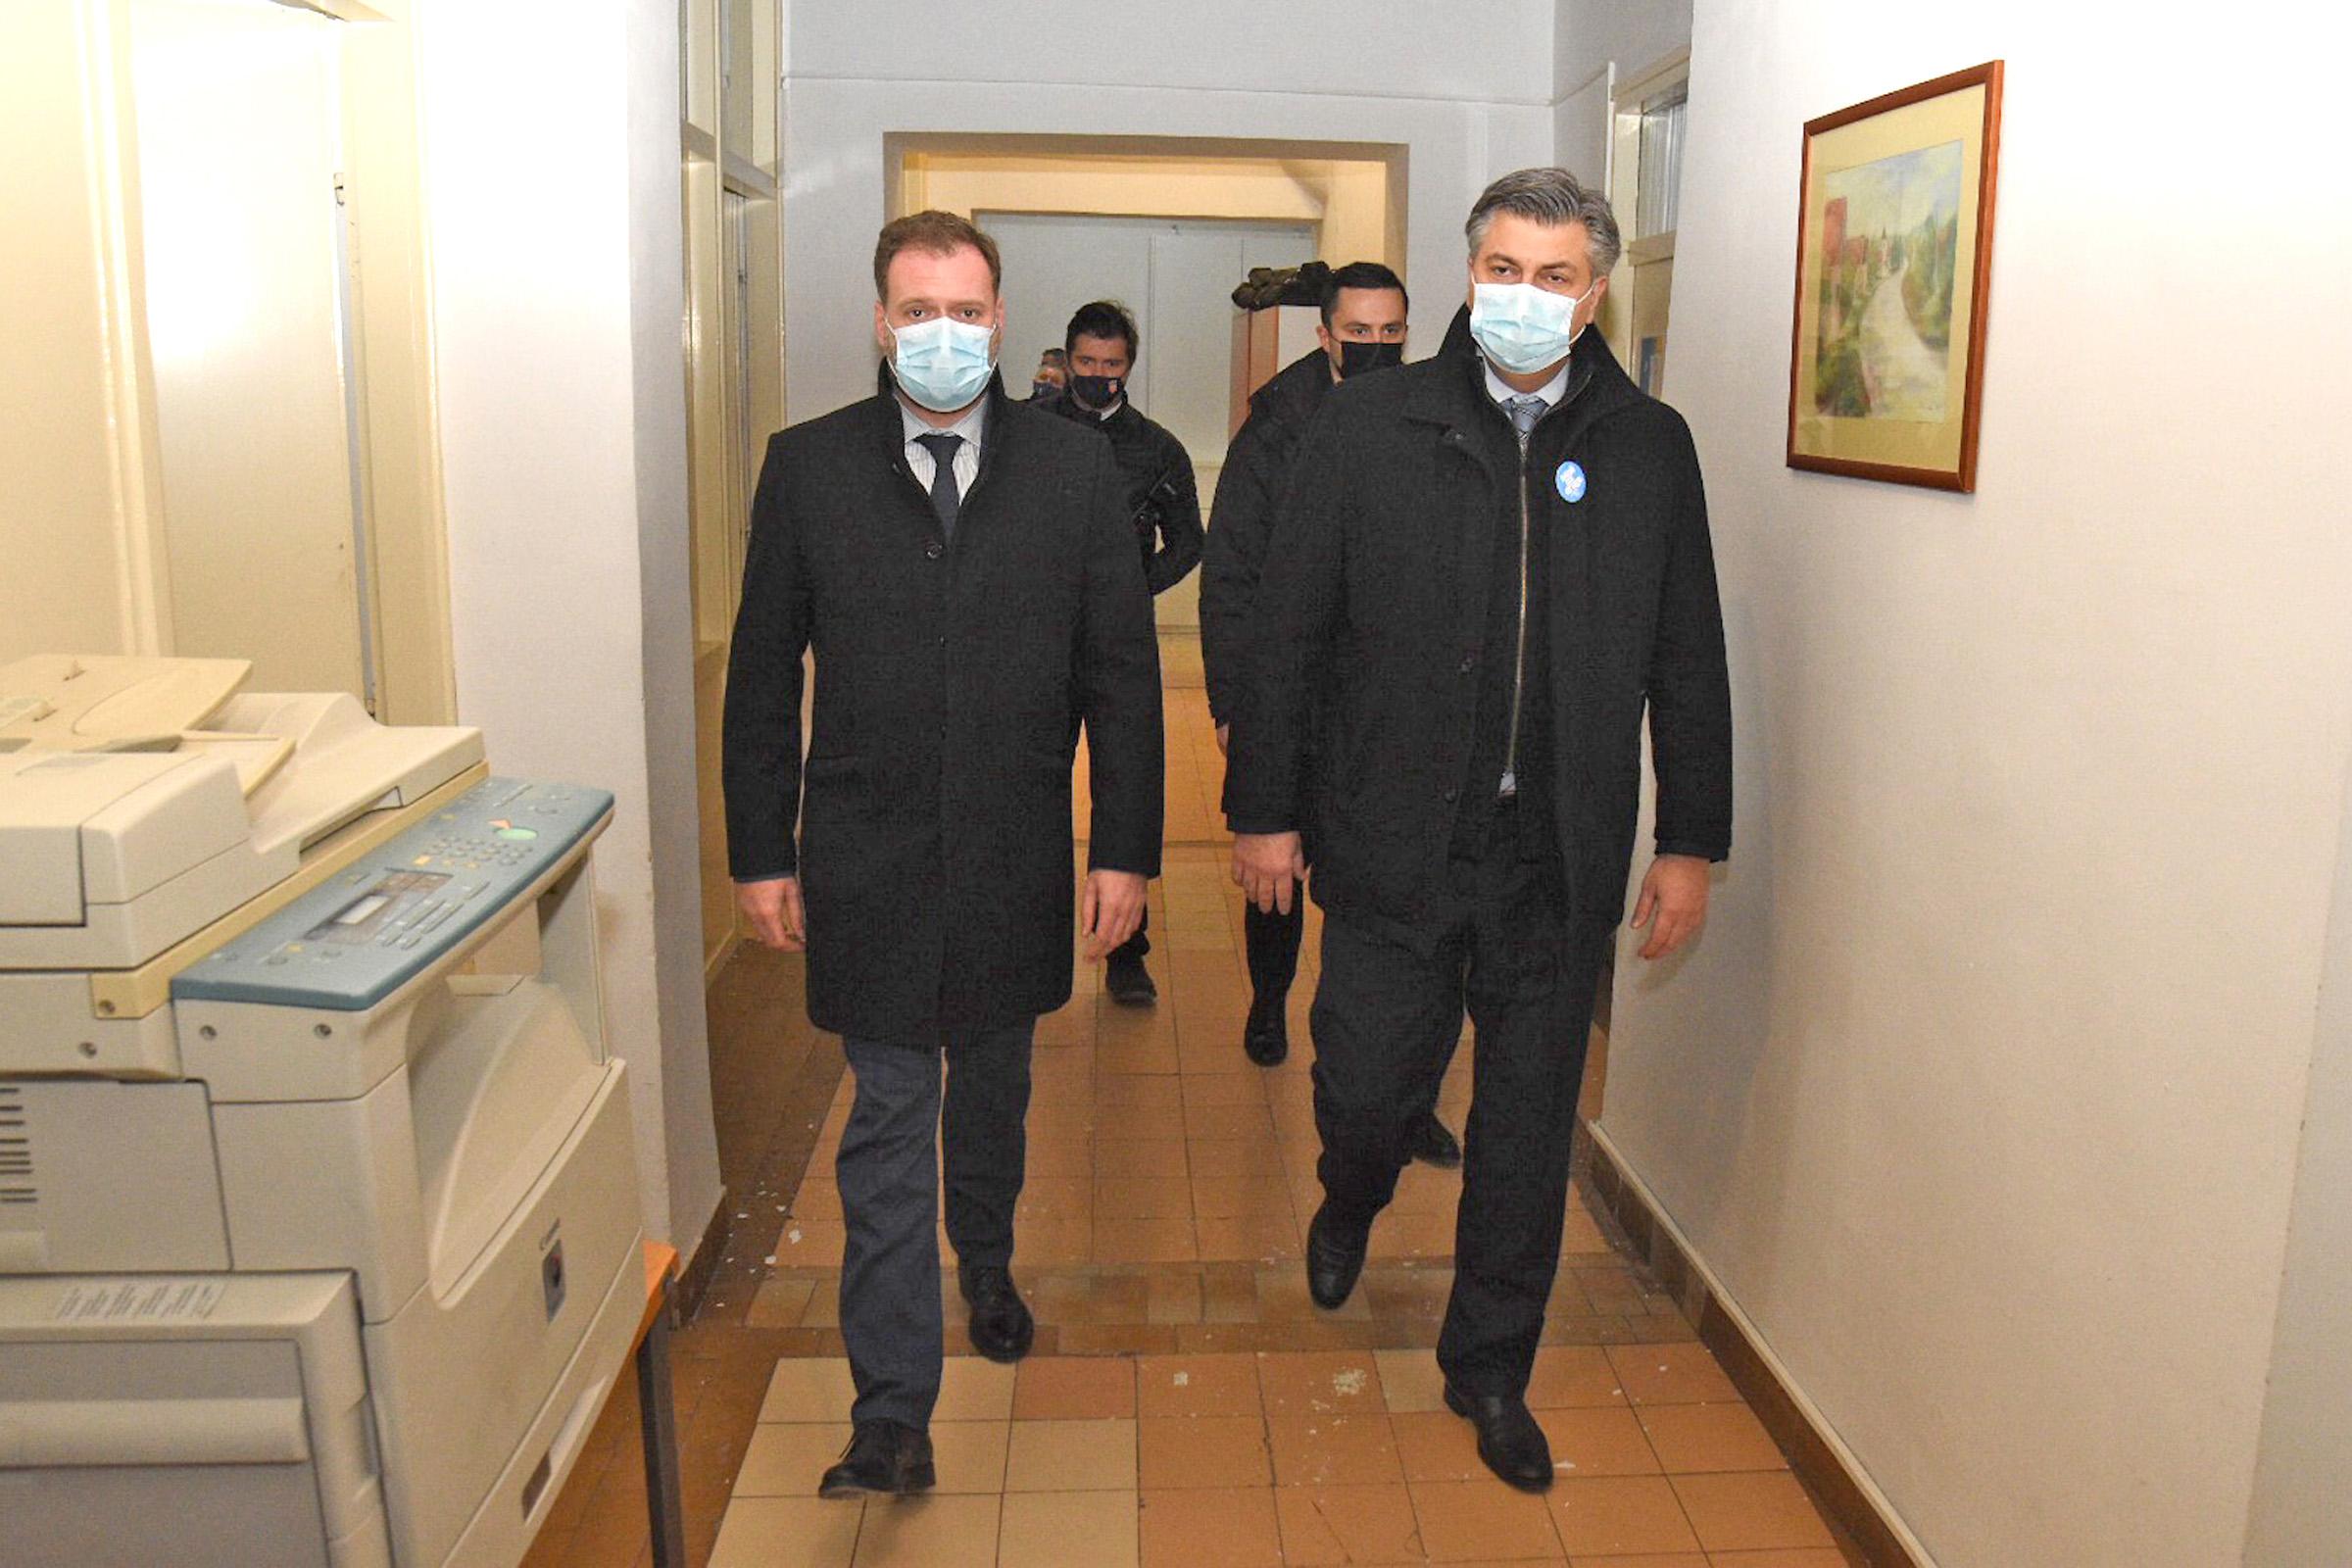 Ministar Banožić obišao potresom pogođena područja Siska i Petrinje